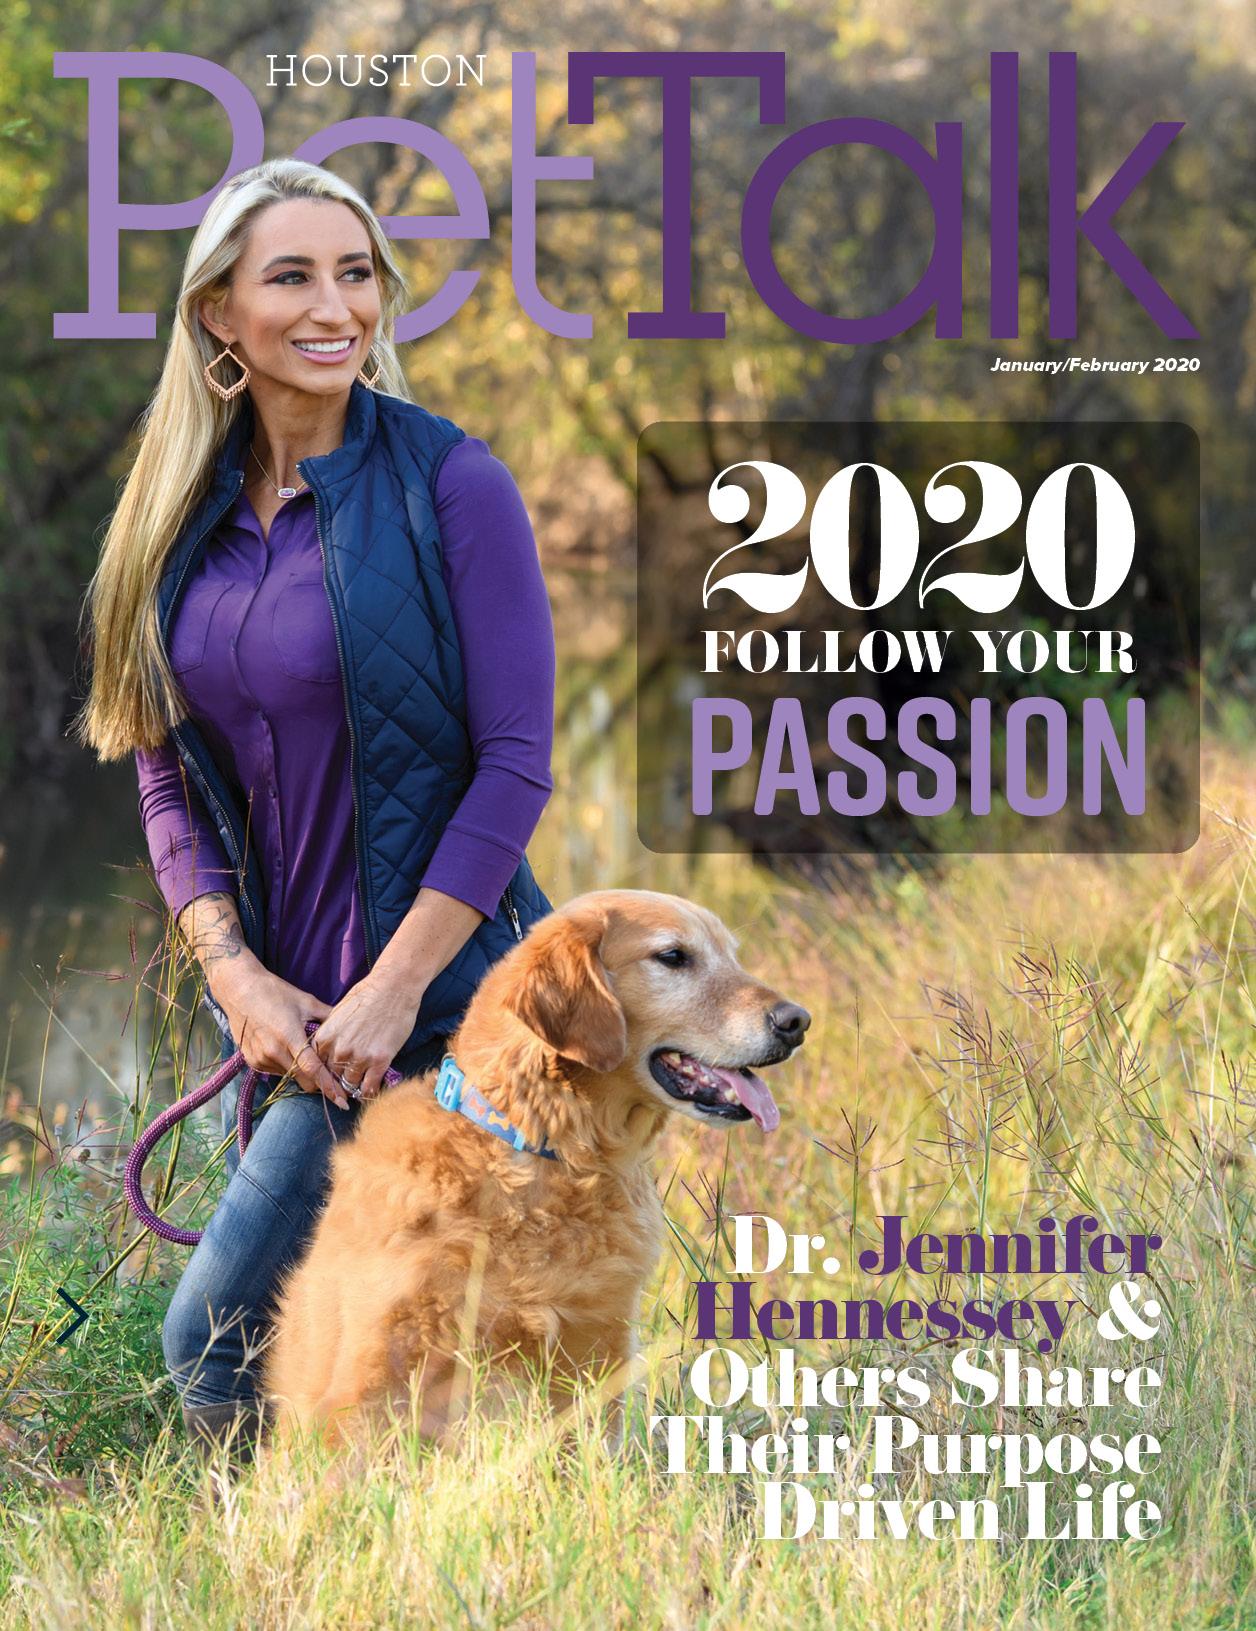 January/February 2020 Digital Issue of Houston PetTalk